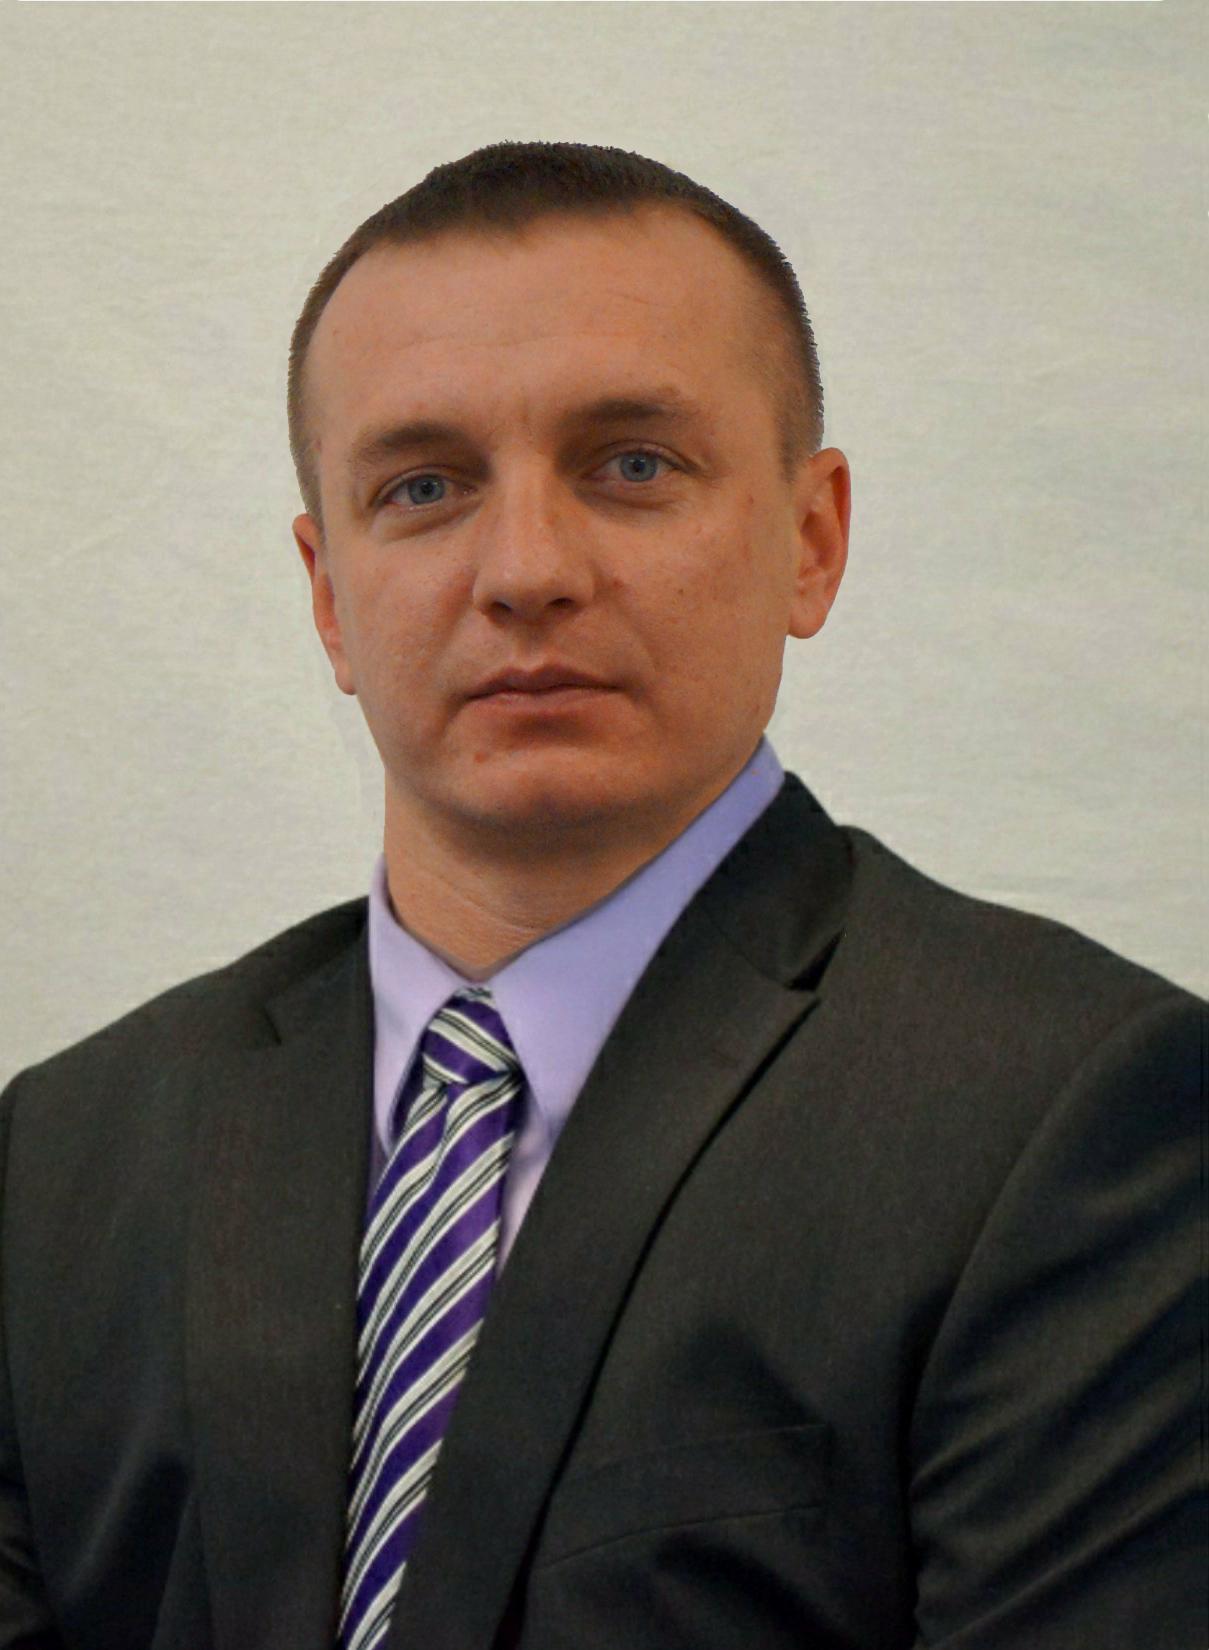 Michael Bafia